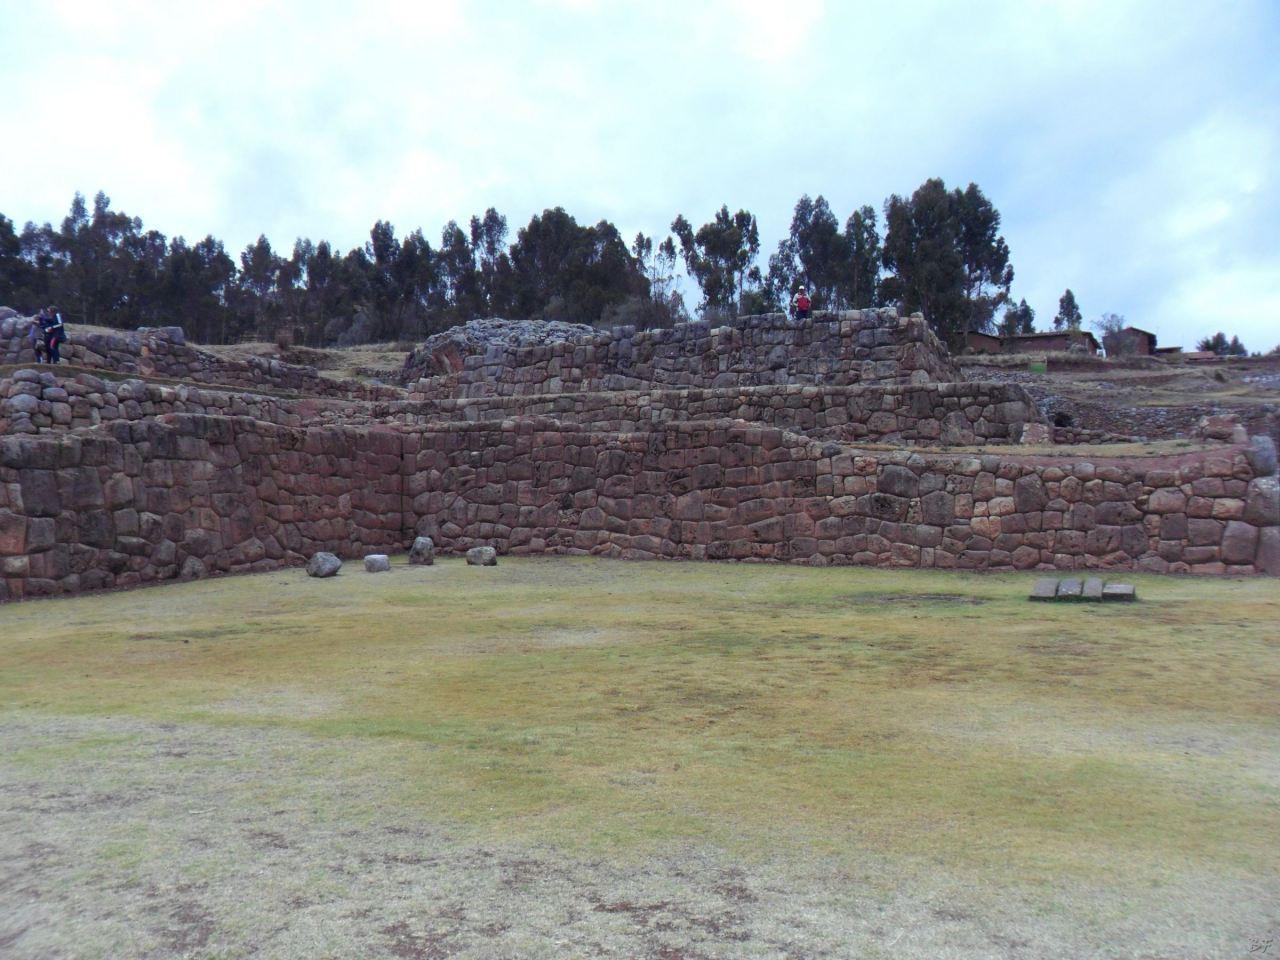 Chinchero-Mura-Poligonali-Piramide-Urubamba-Peru-1